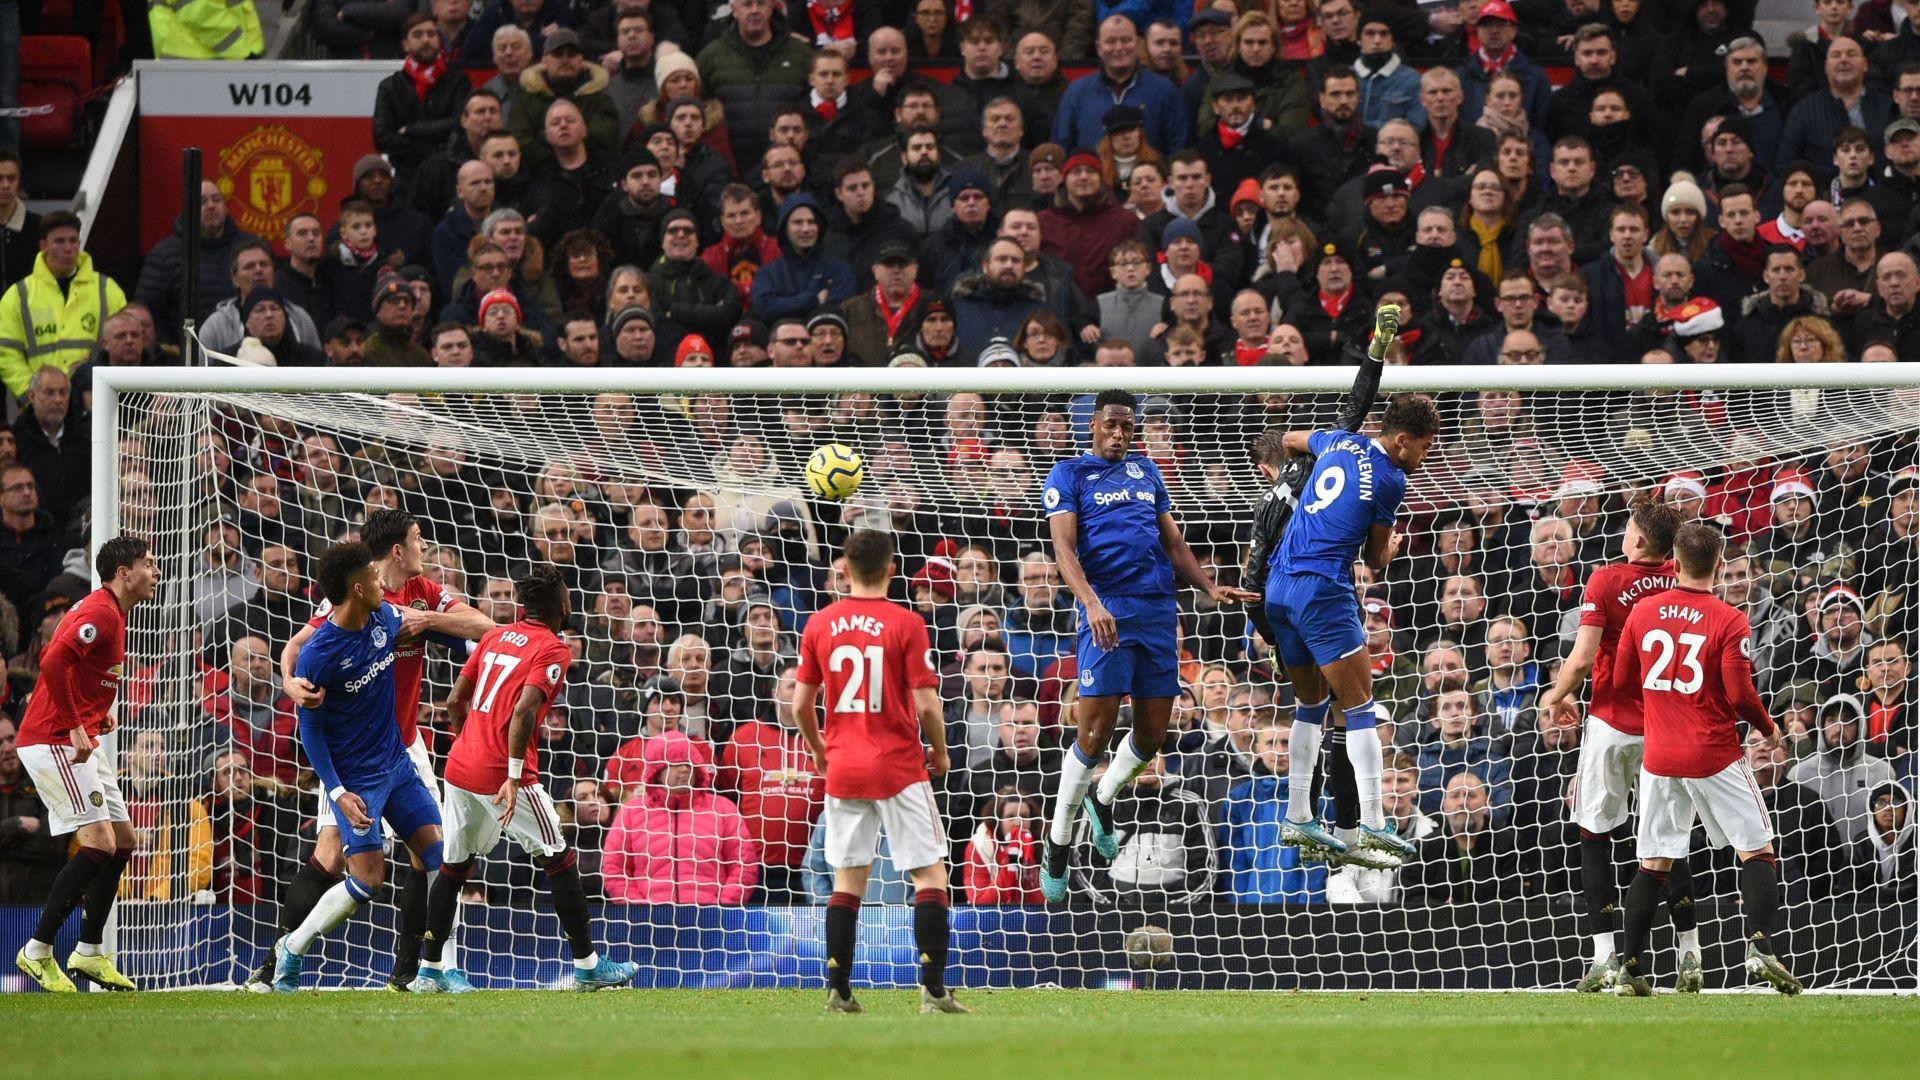 Everton Vs Man United Drama Sepak Bola Di Goodison Park